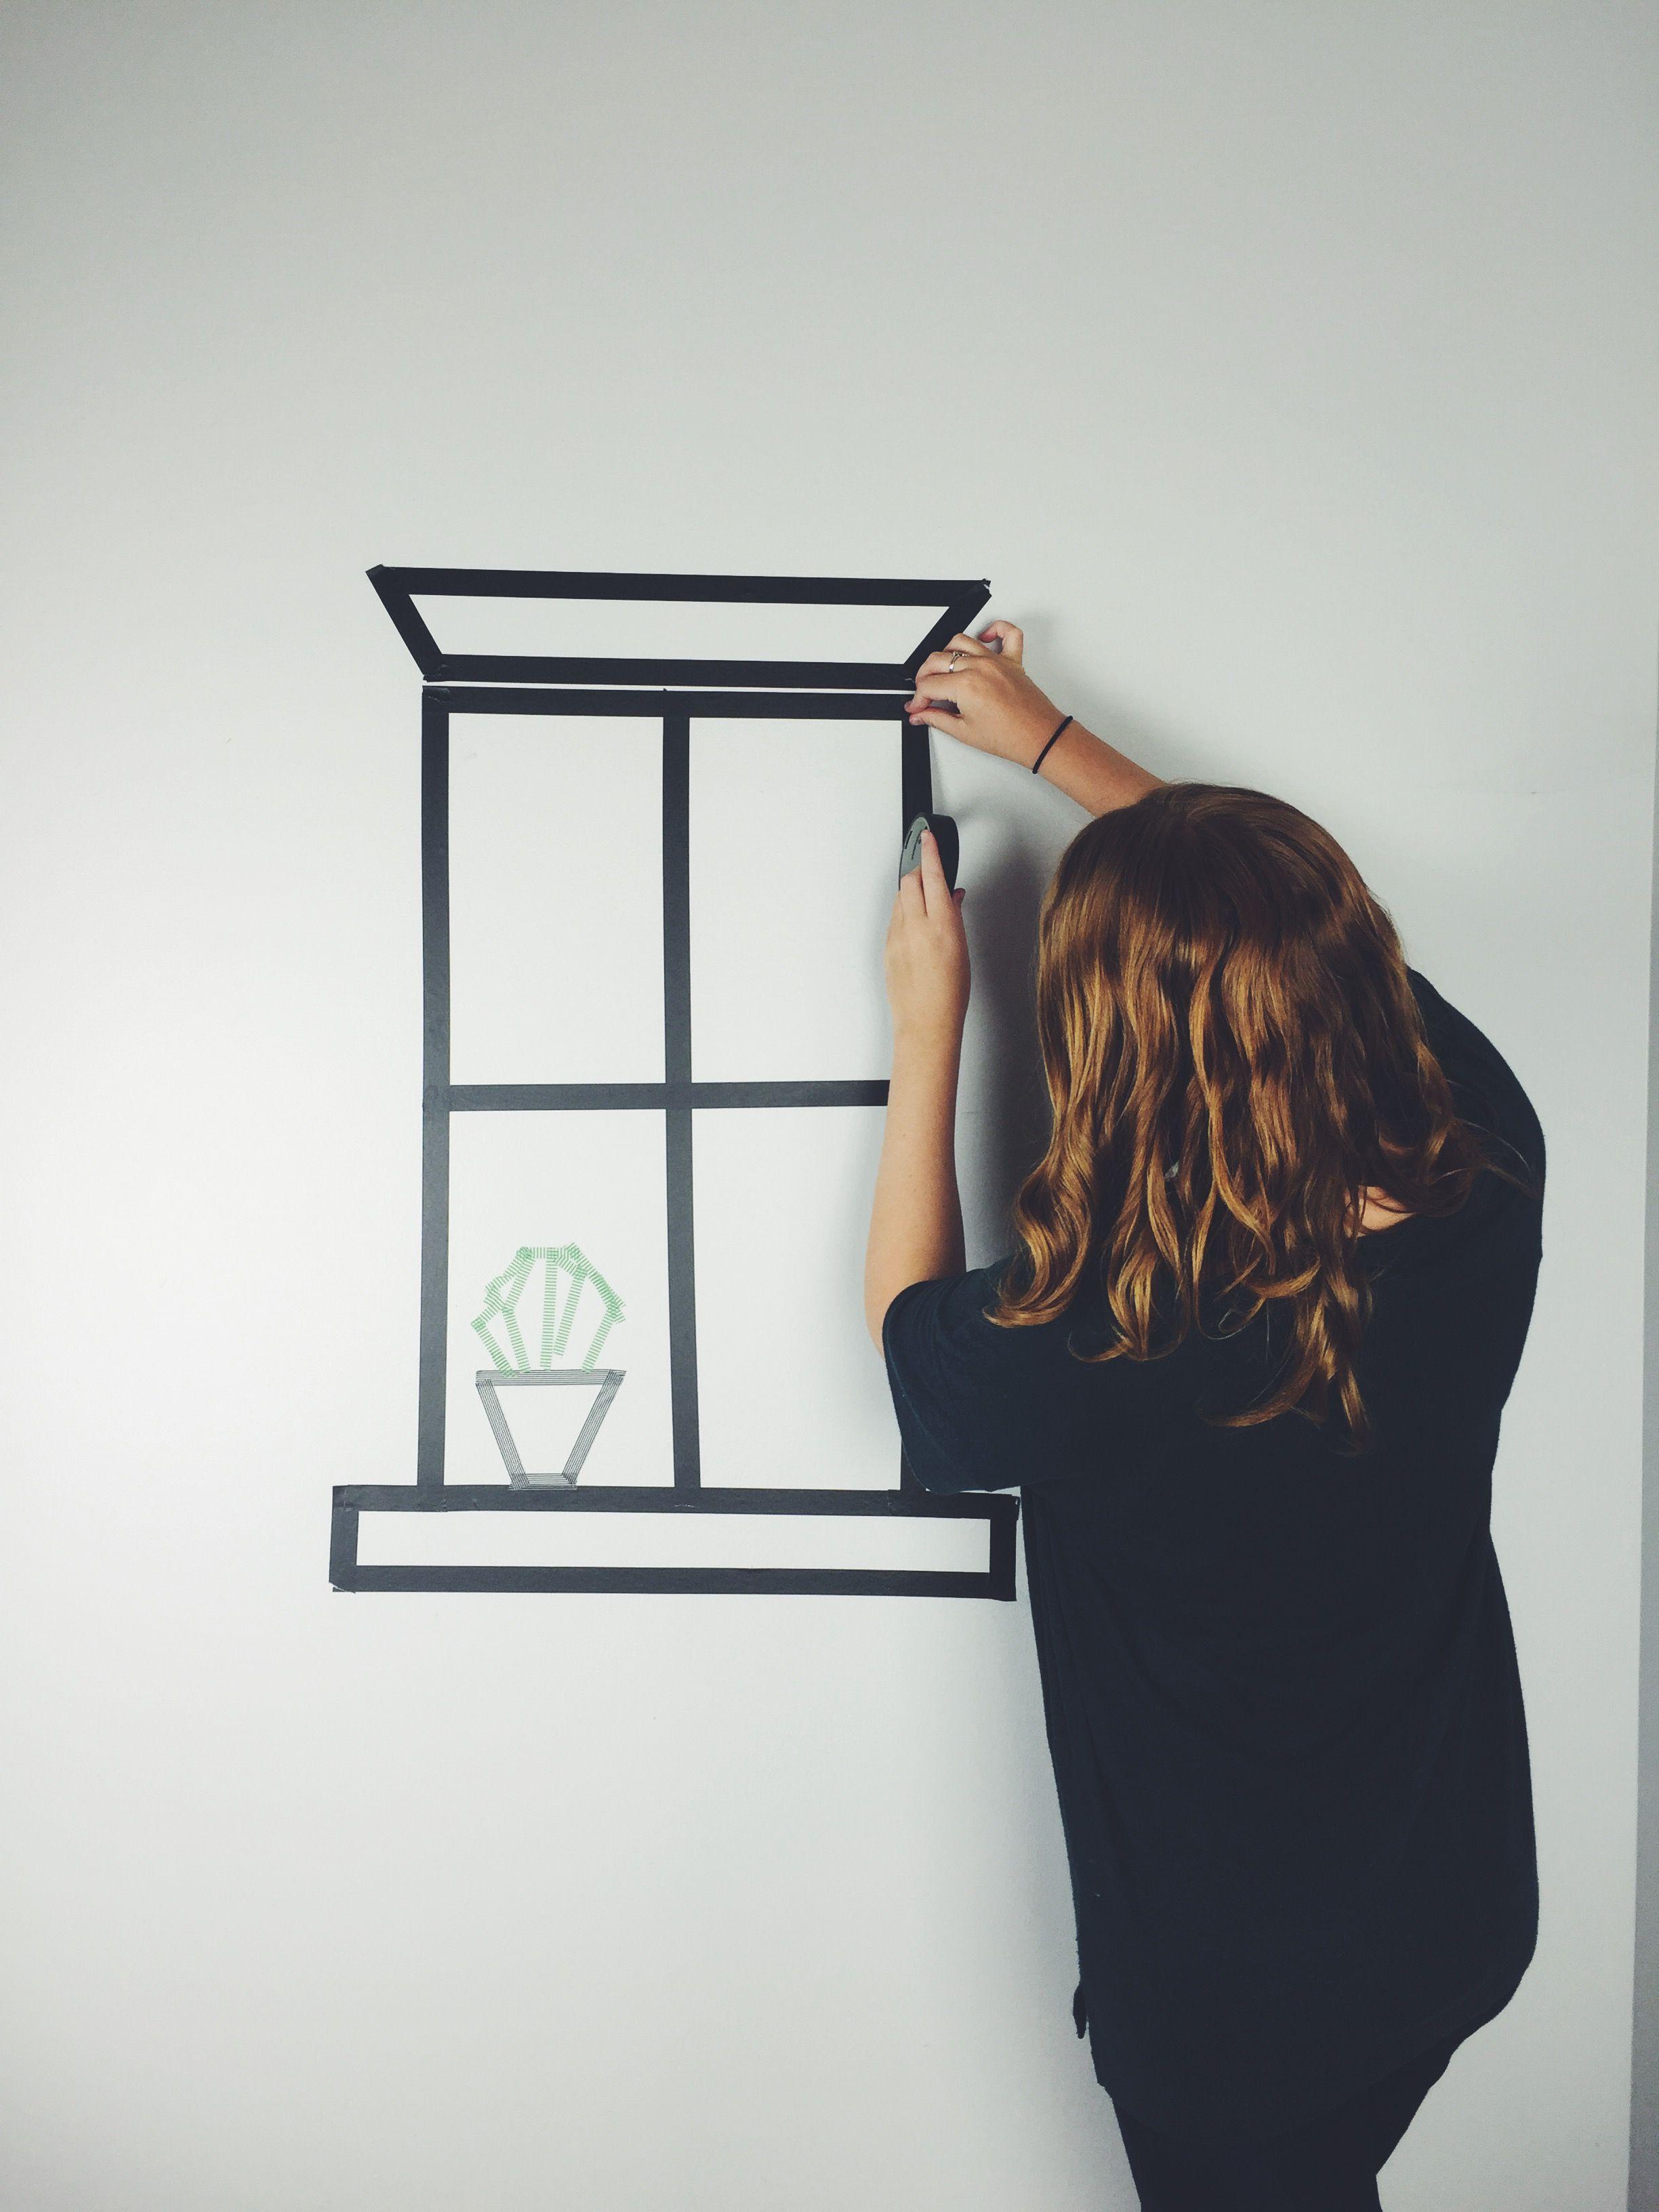 Dorm Wall Art: Washi Tape Windows | DIYs/Crafts | Dorm walls